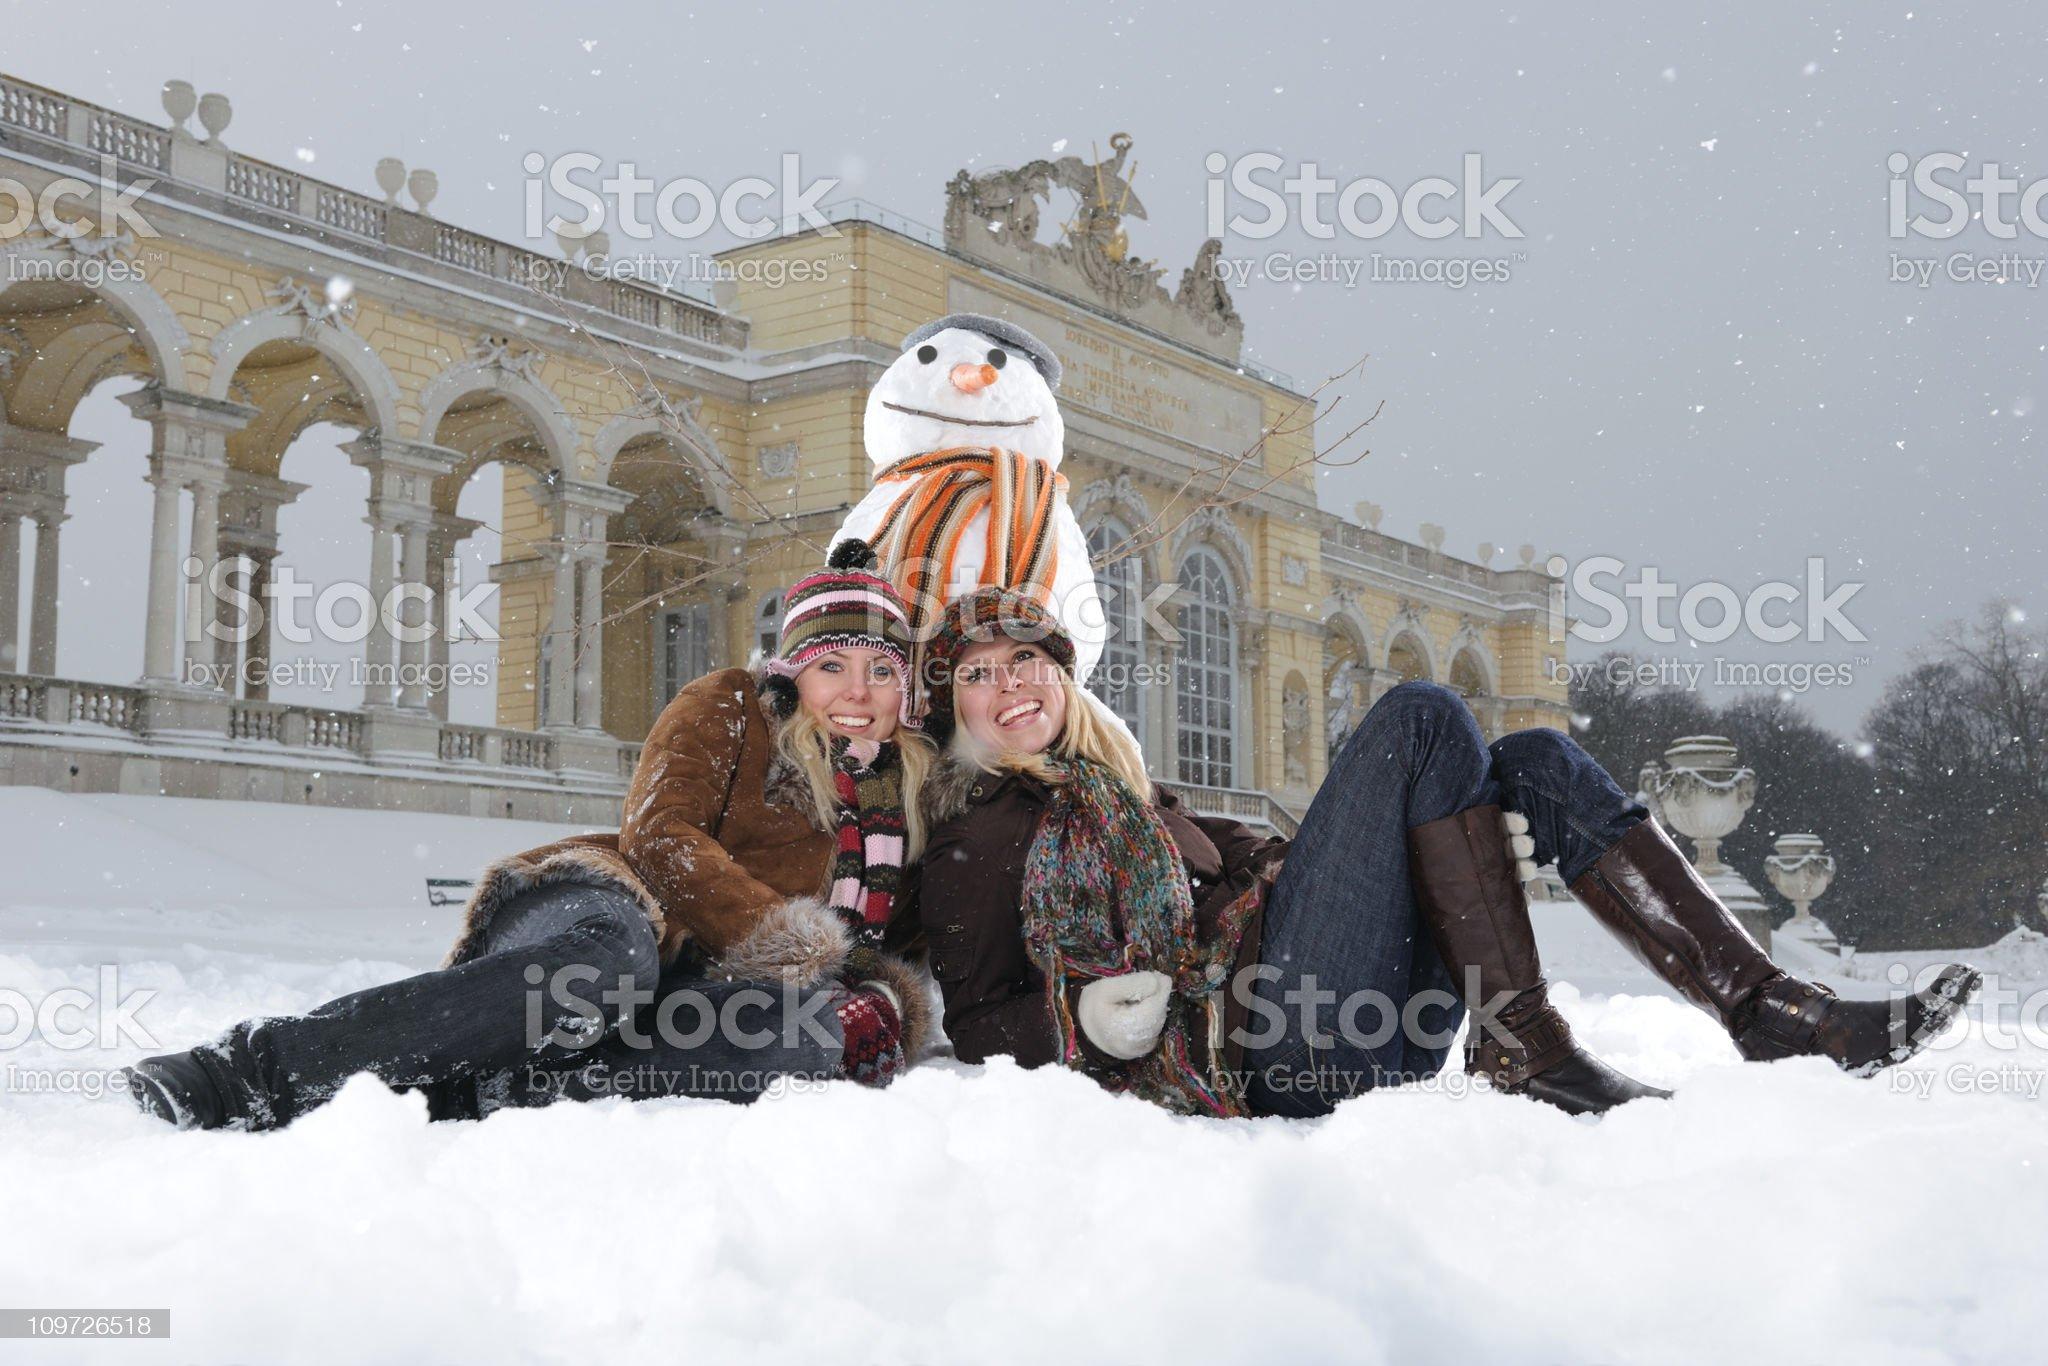 Winter Fun - Two beautiful smiling Women with Snowman royalty-free stock photo